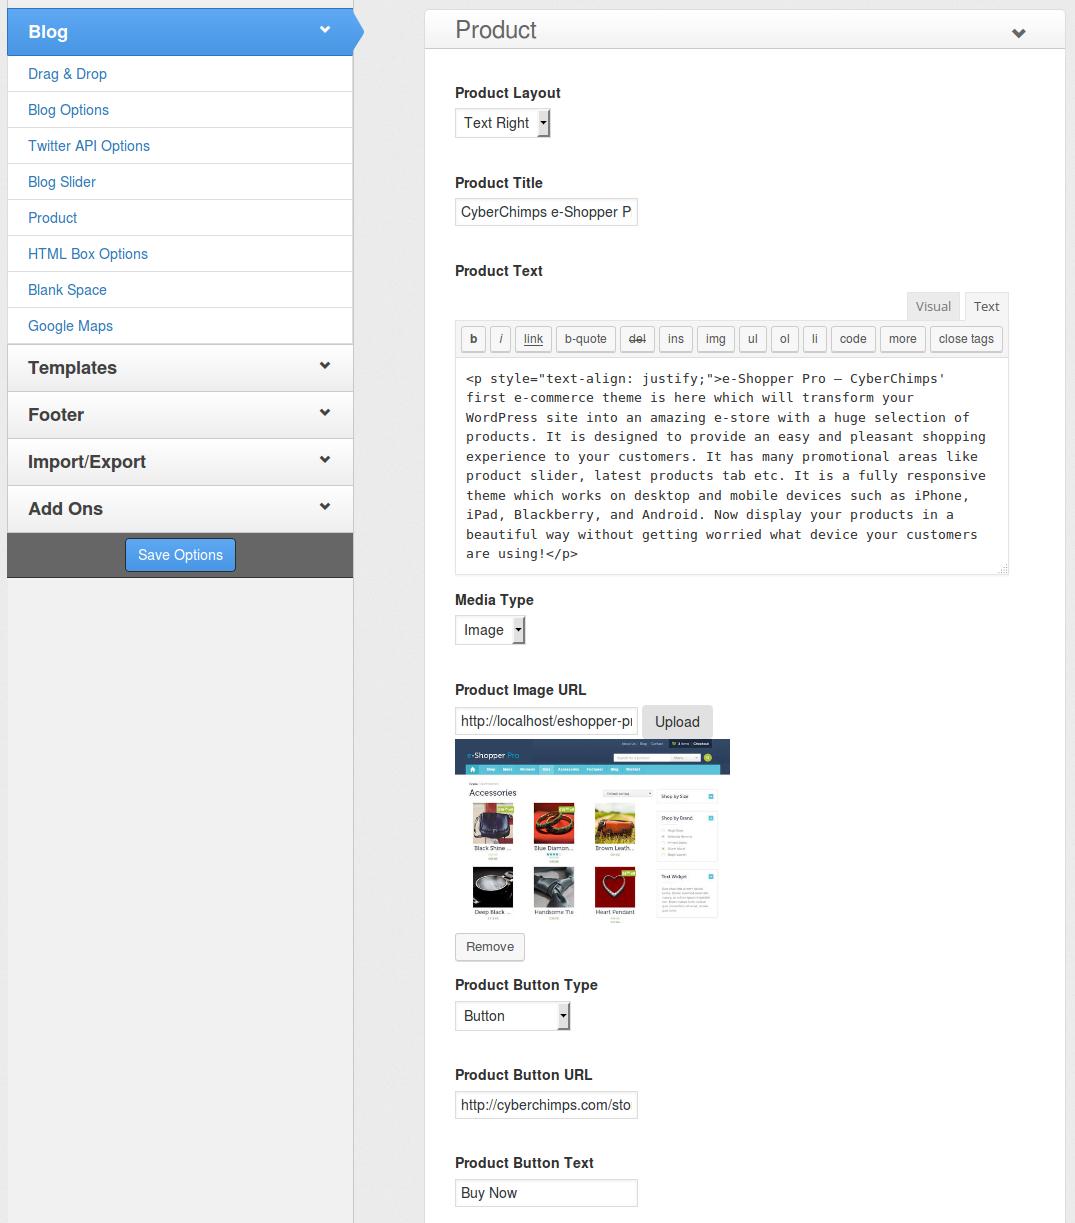 e-Shopper Pro - Blog Drag & Drop elements - Product